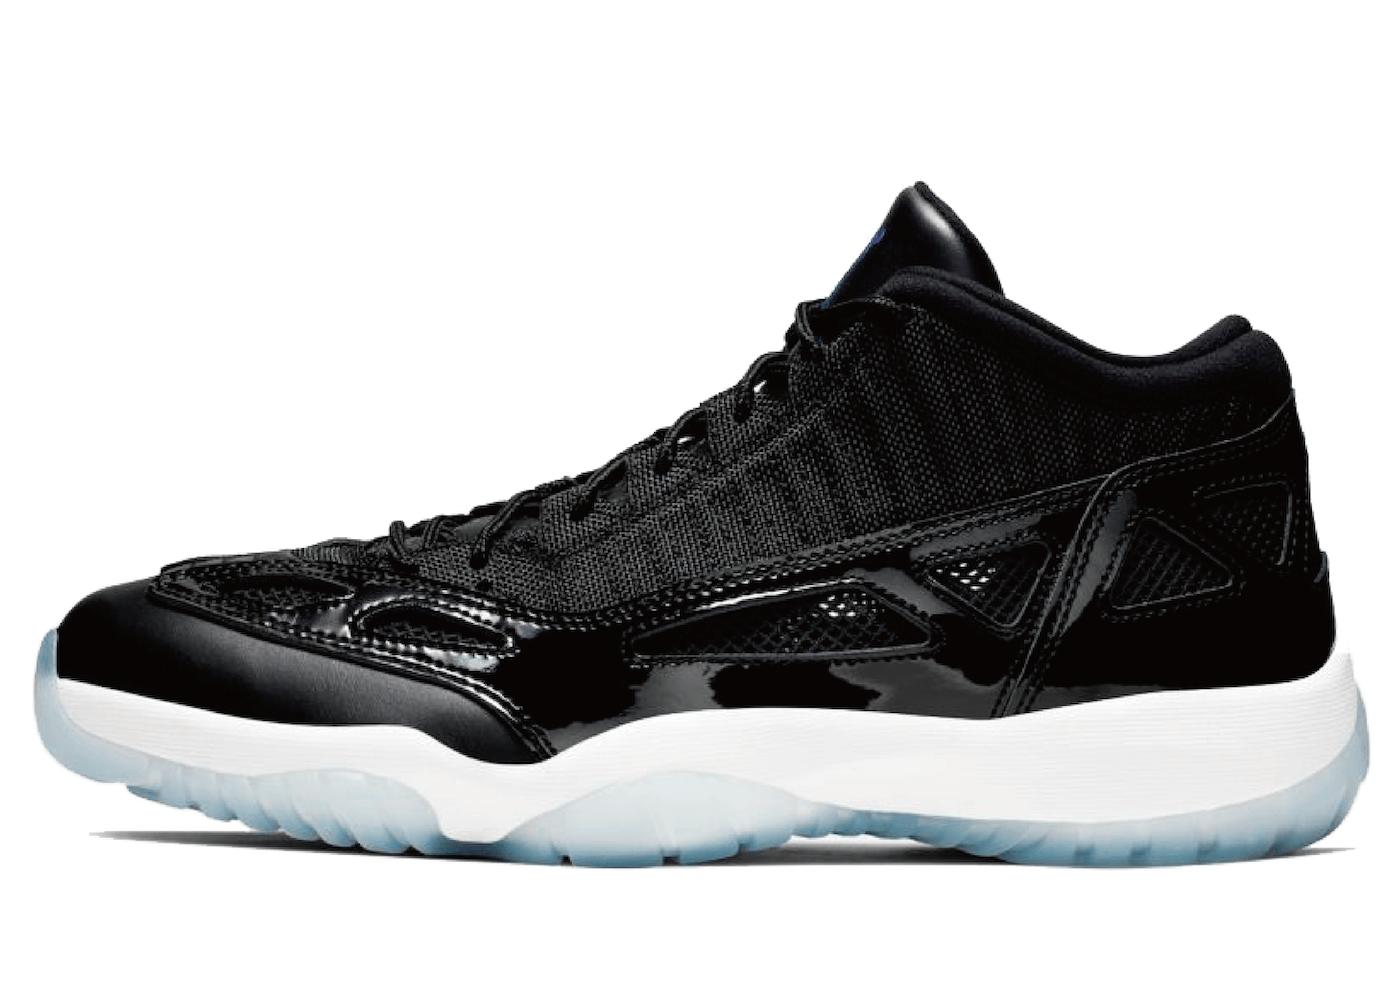 Nike Air Jordan 11 Low IE Space Jamの写真